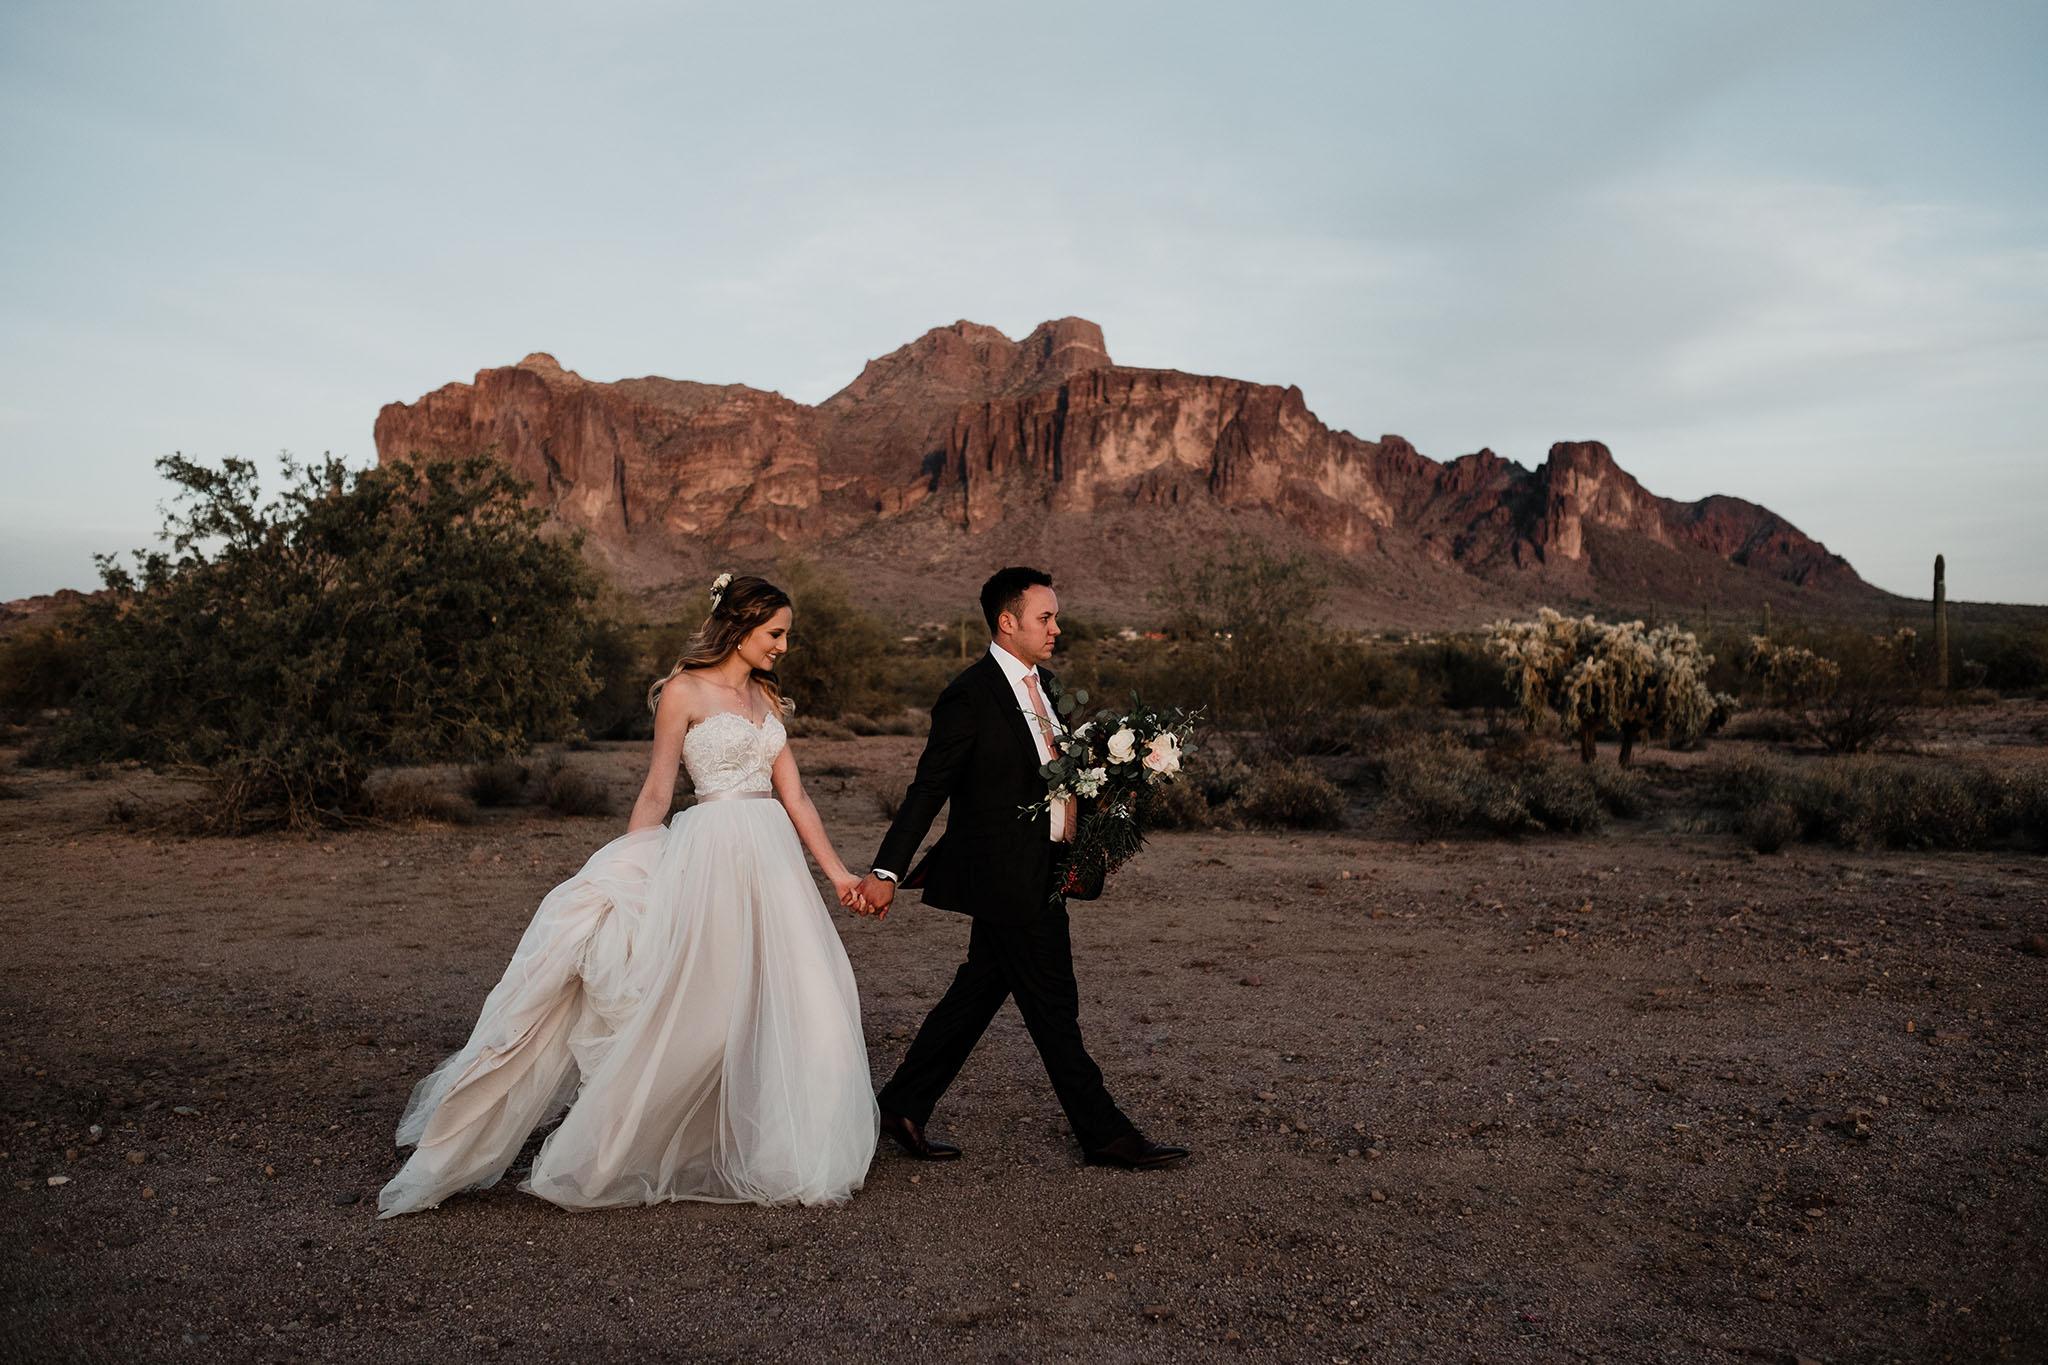 Arizona-Wedding-Photographer-The-Paseo-Venue33.jpg